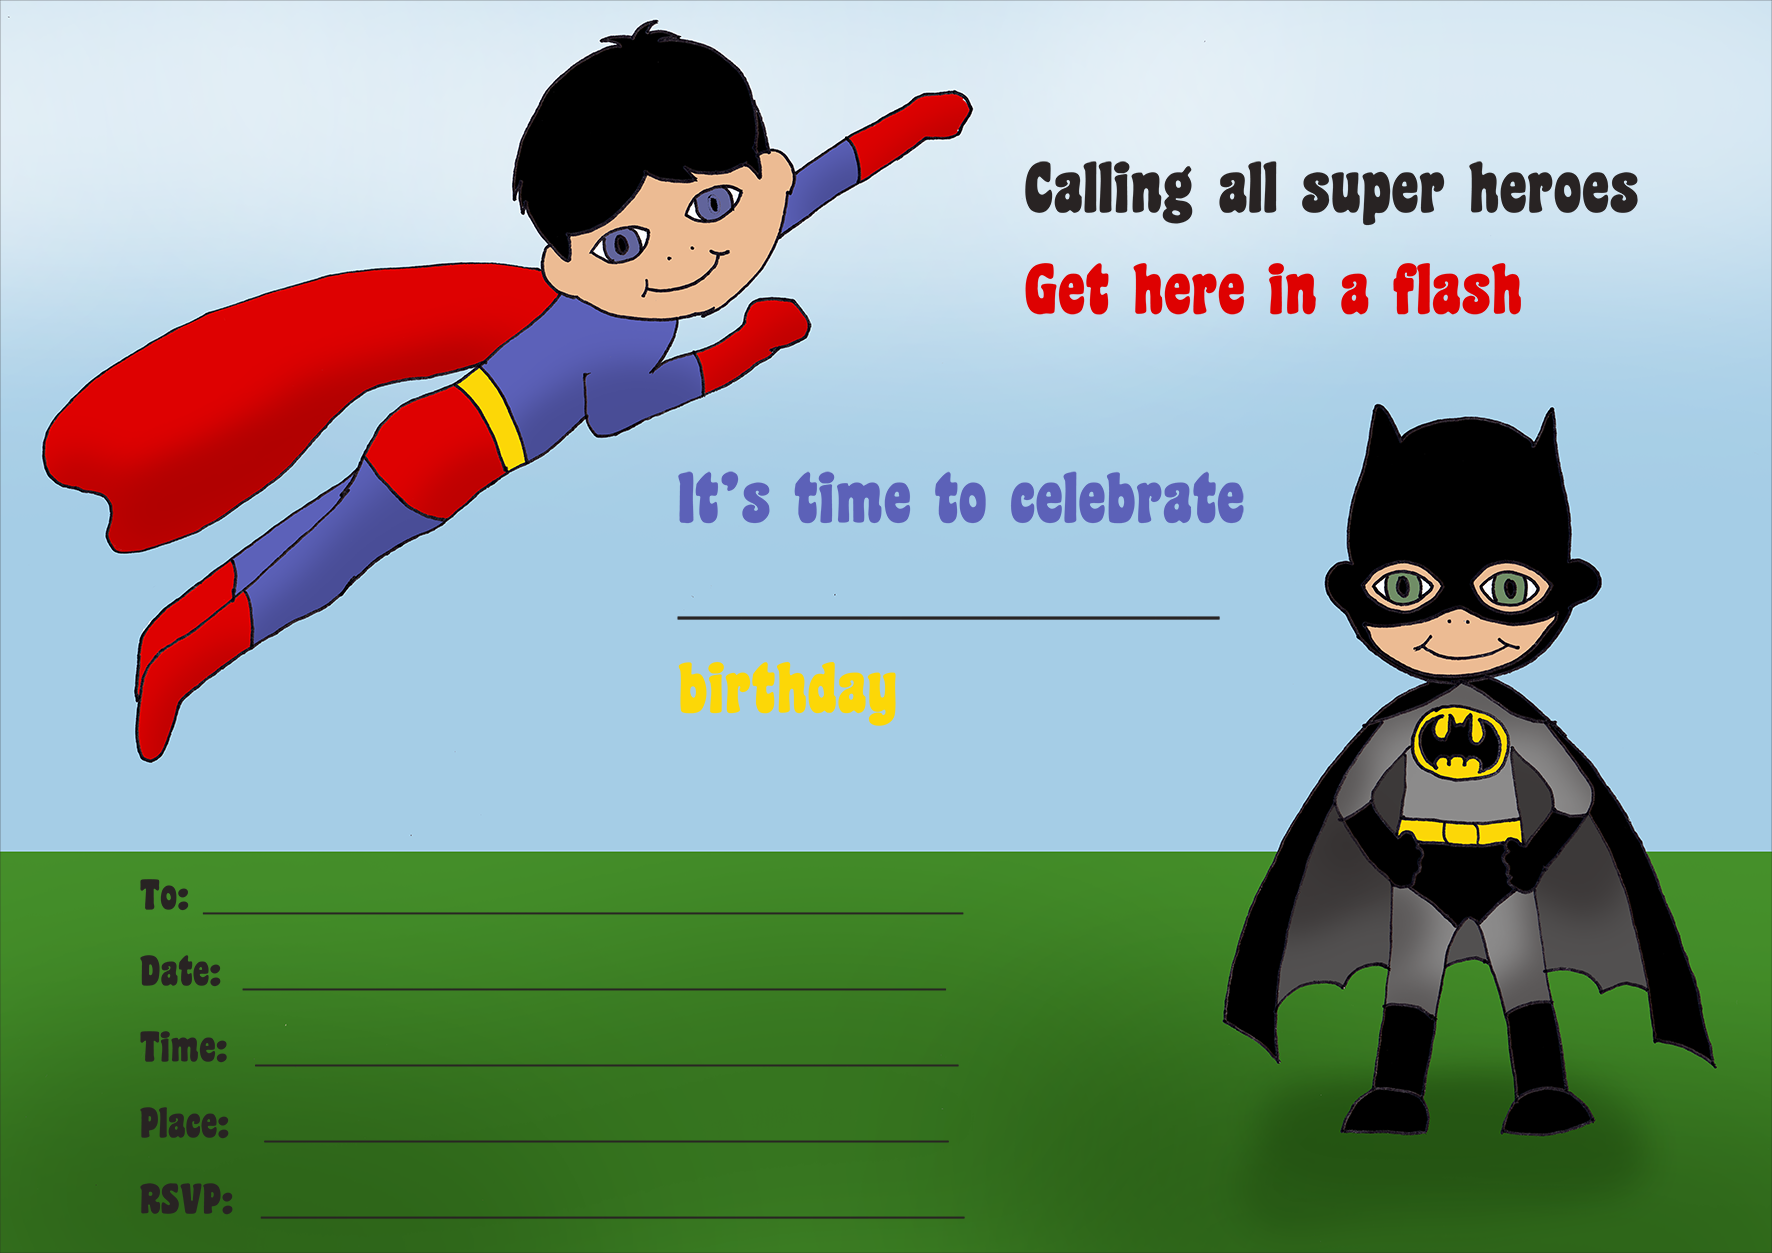 Super hero birthday party invitation for kids to print: superman and batman theme.